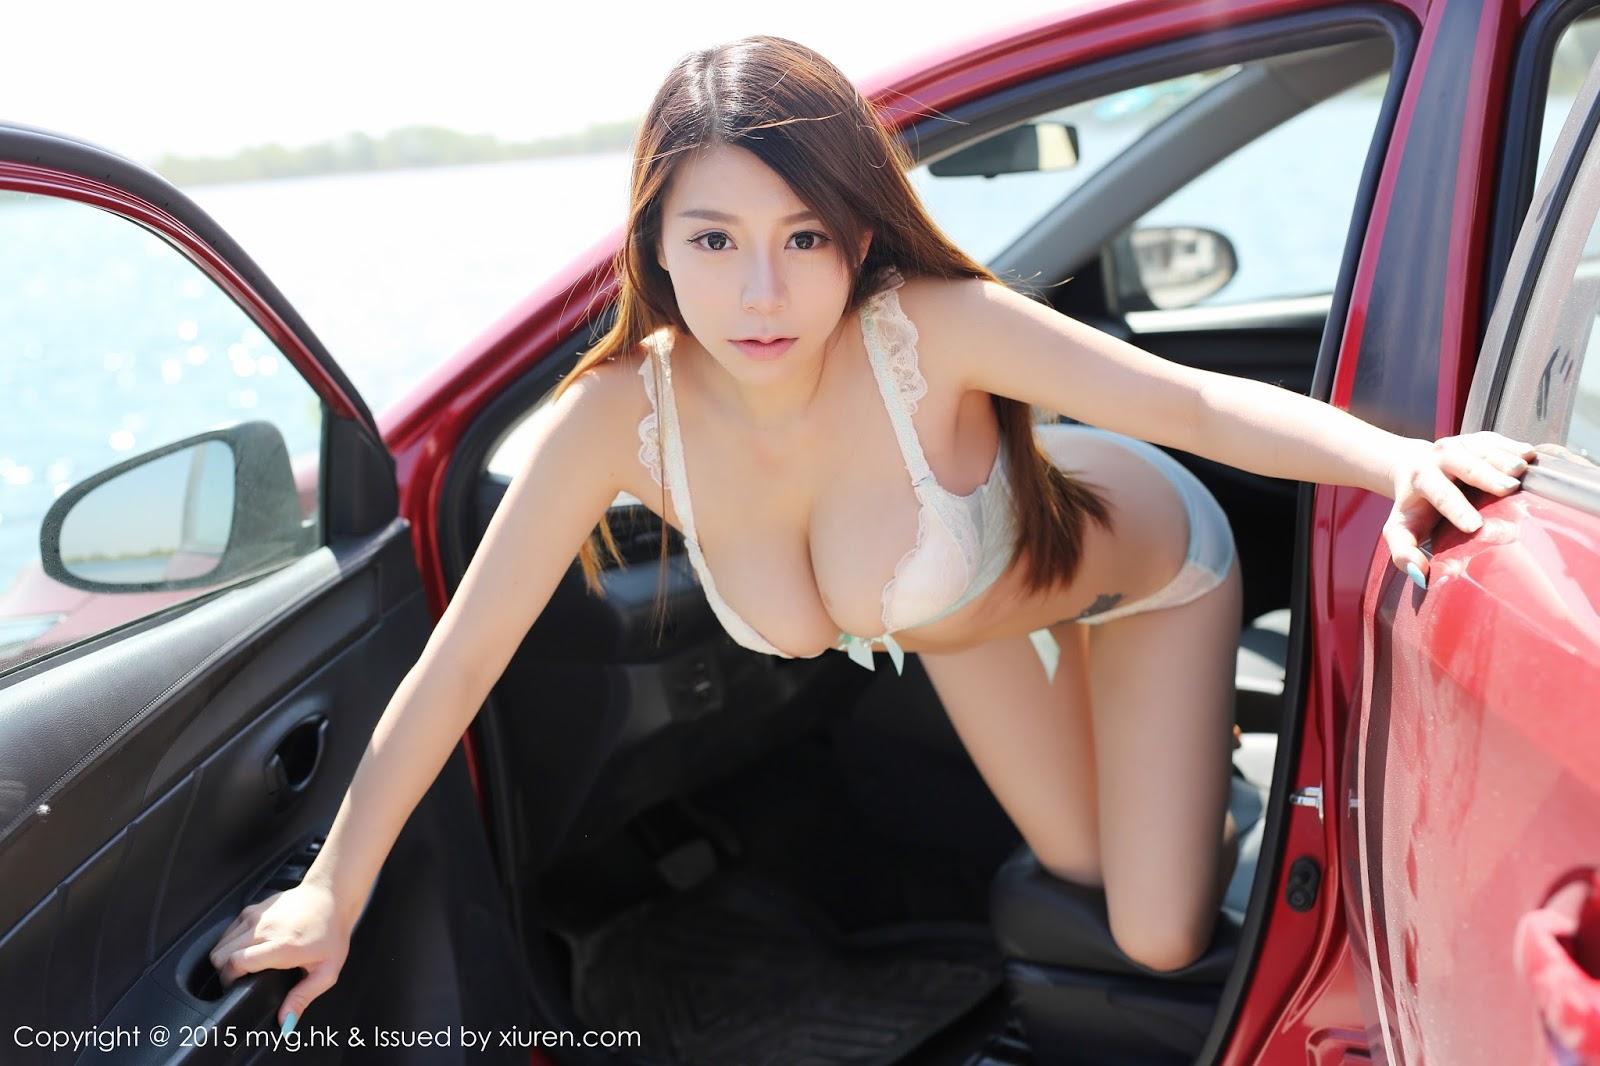 MyGirl - Vol.110 Vetiver (49 pics) - New Vetiver Jia Bao Bei Er gravure chinesse girl china